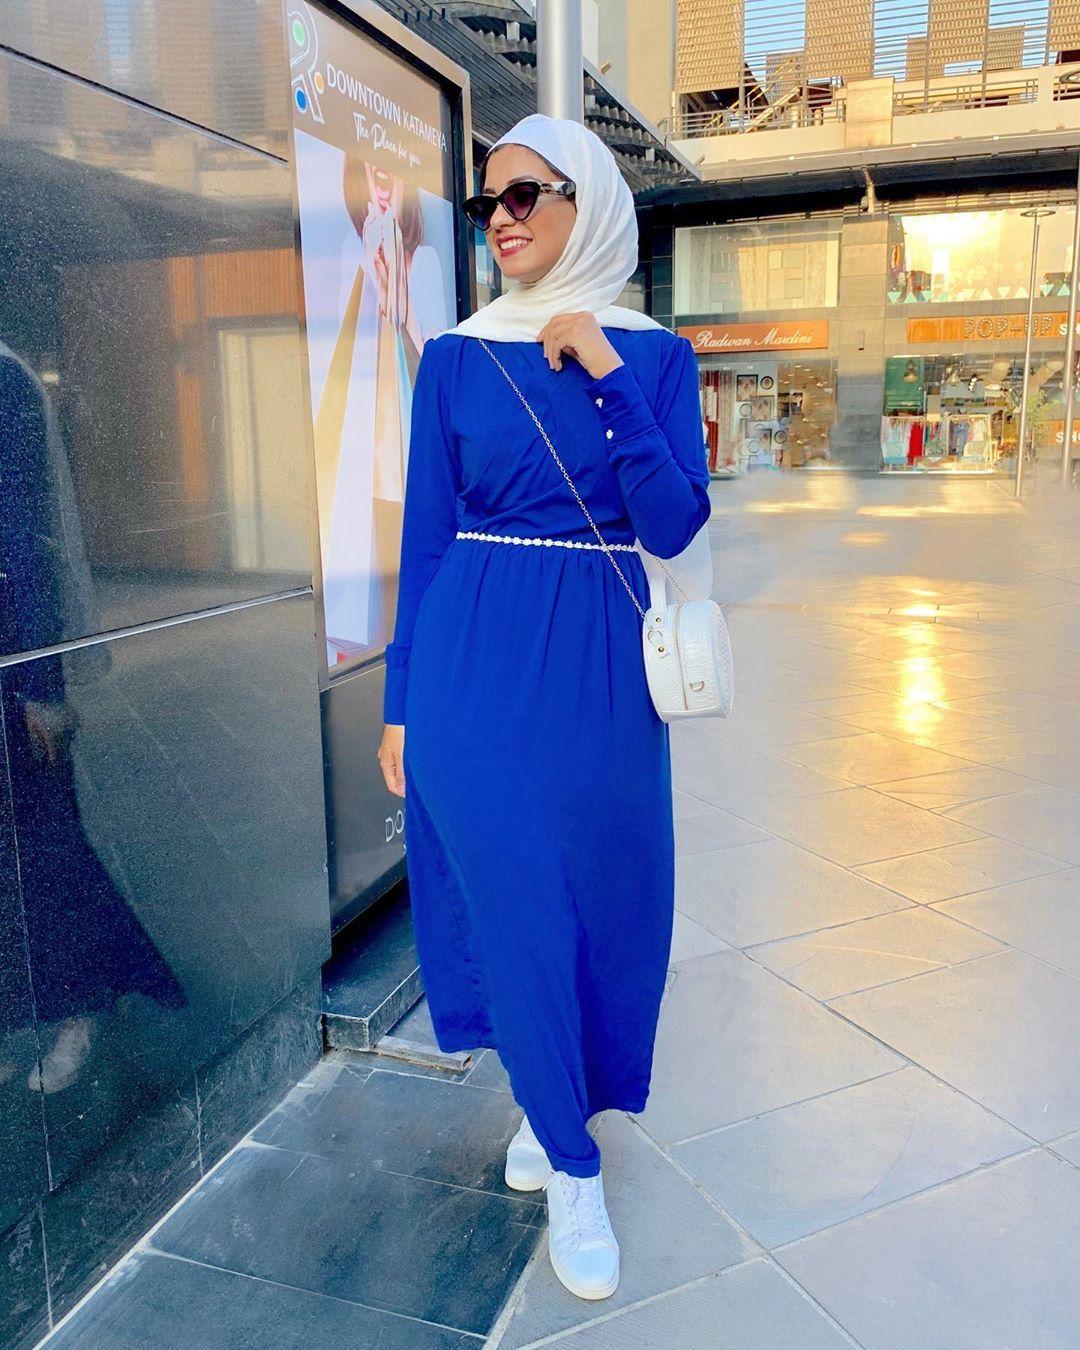 نوران خليفة Di Instagram Learn To Live Without The Person You Can T Live Without Dress From Violleta Muslim Fashion Dress Hijab Fashion Fashion